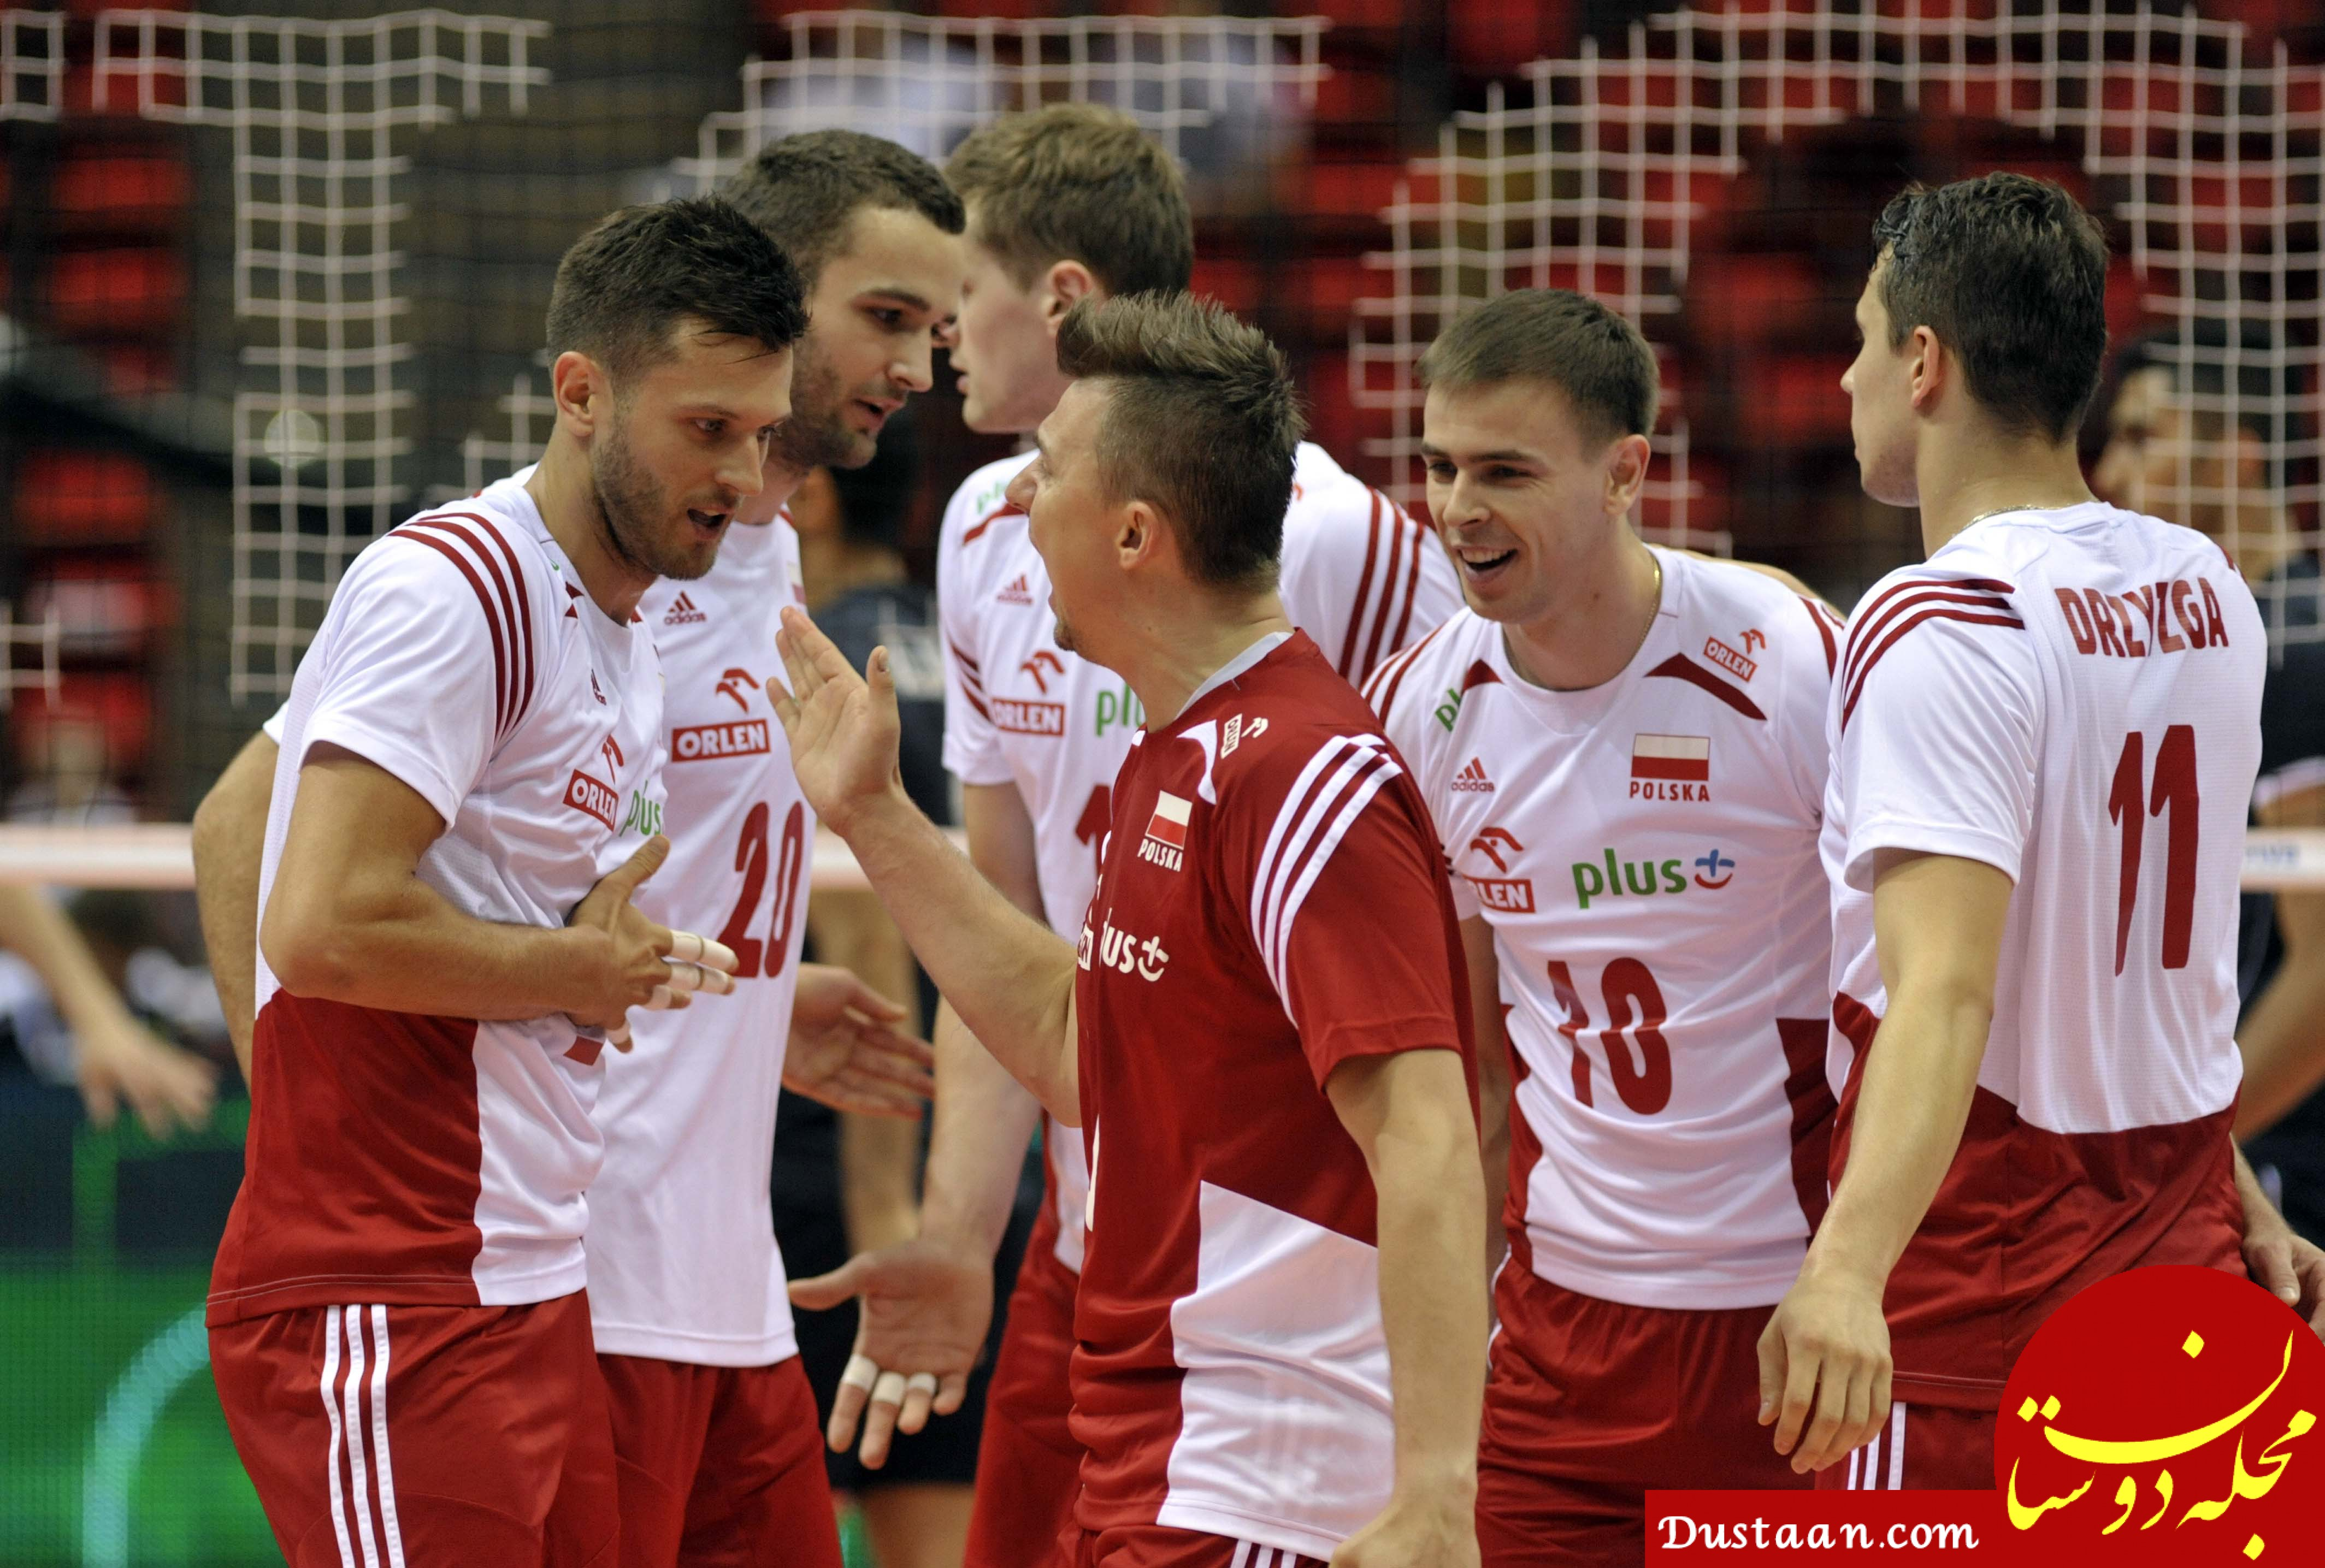 www.dustaan.com شکایت فدراسیون والیبال لهستان از ایران به FIVB